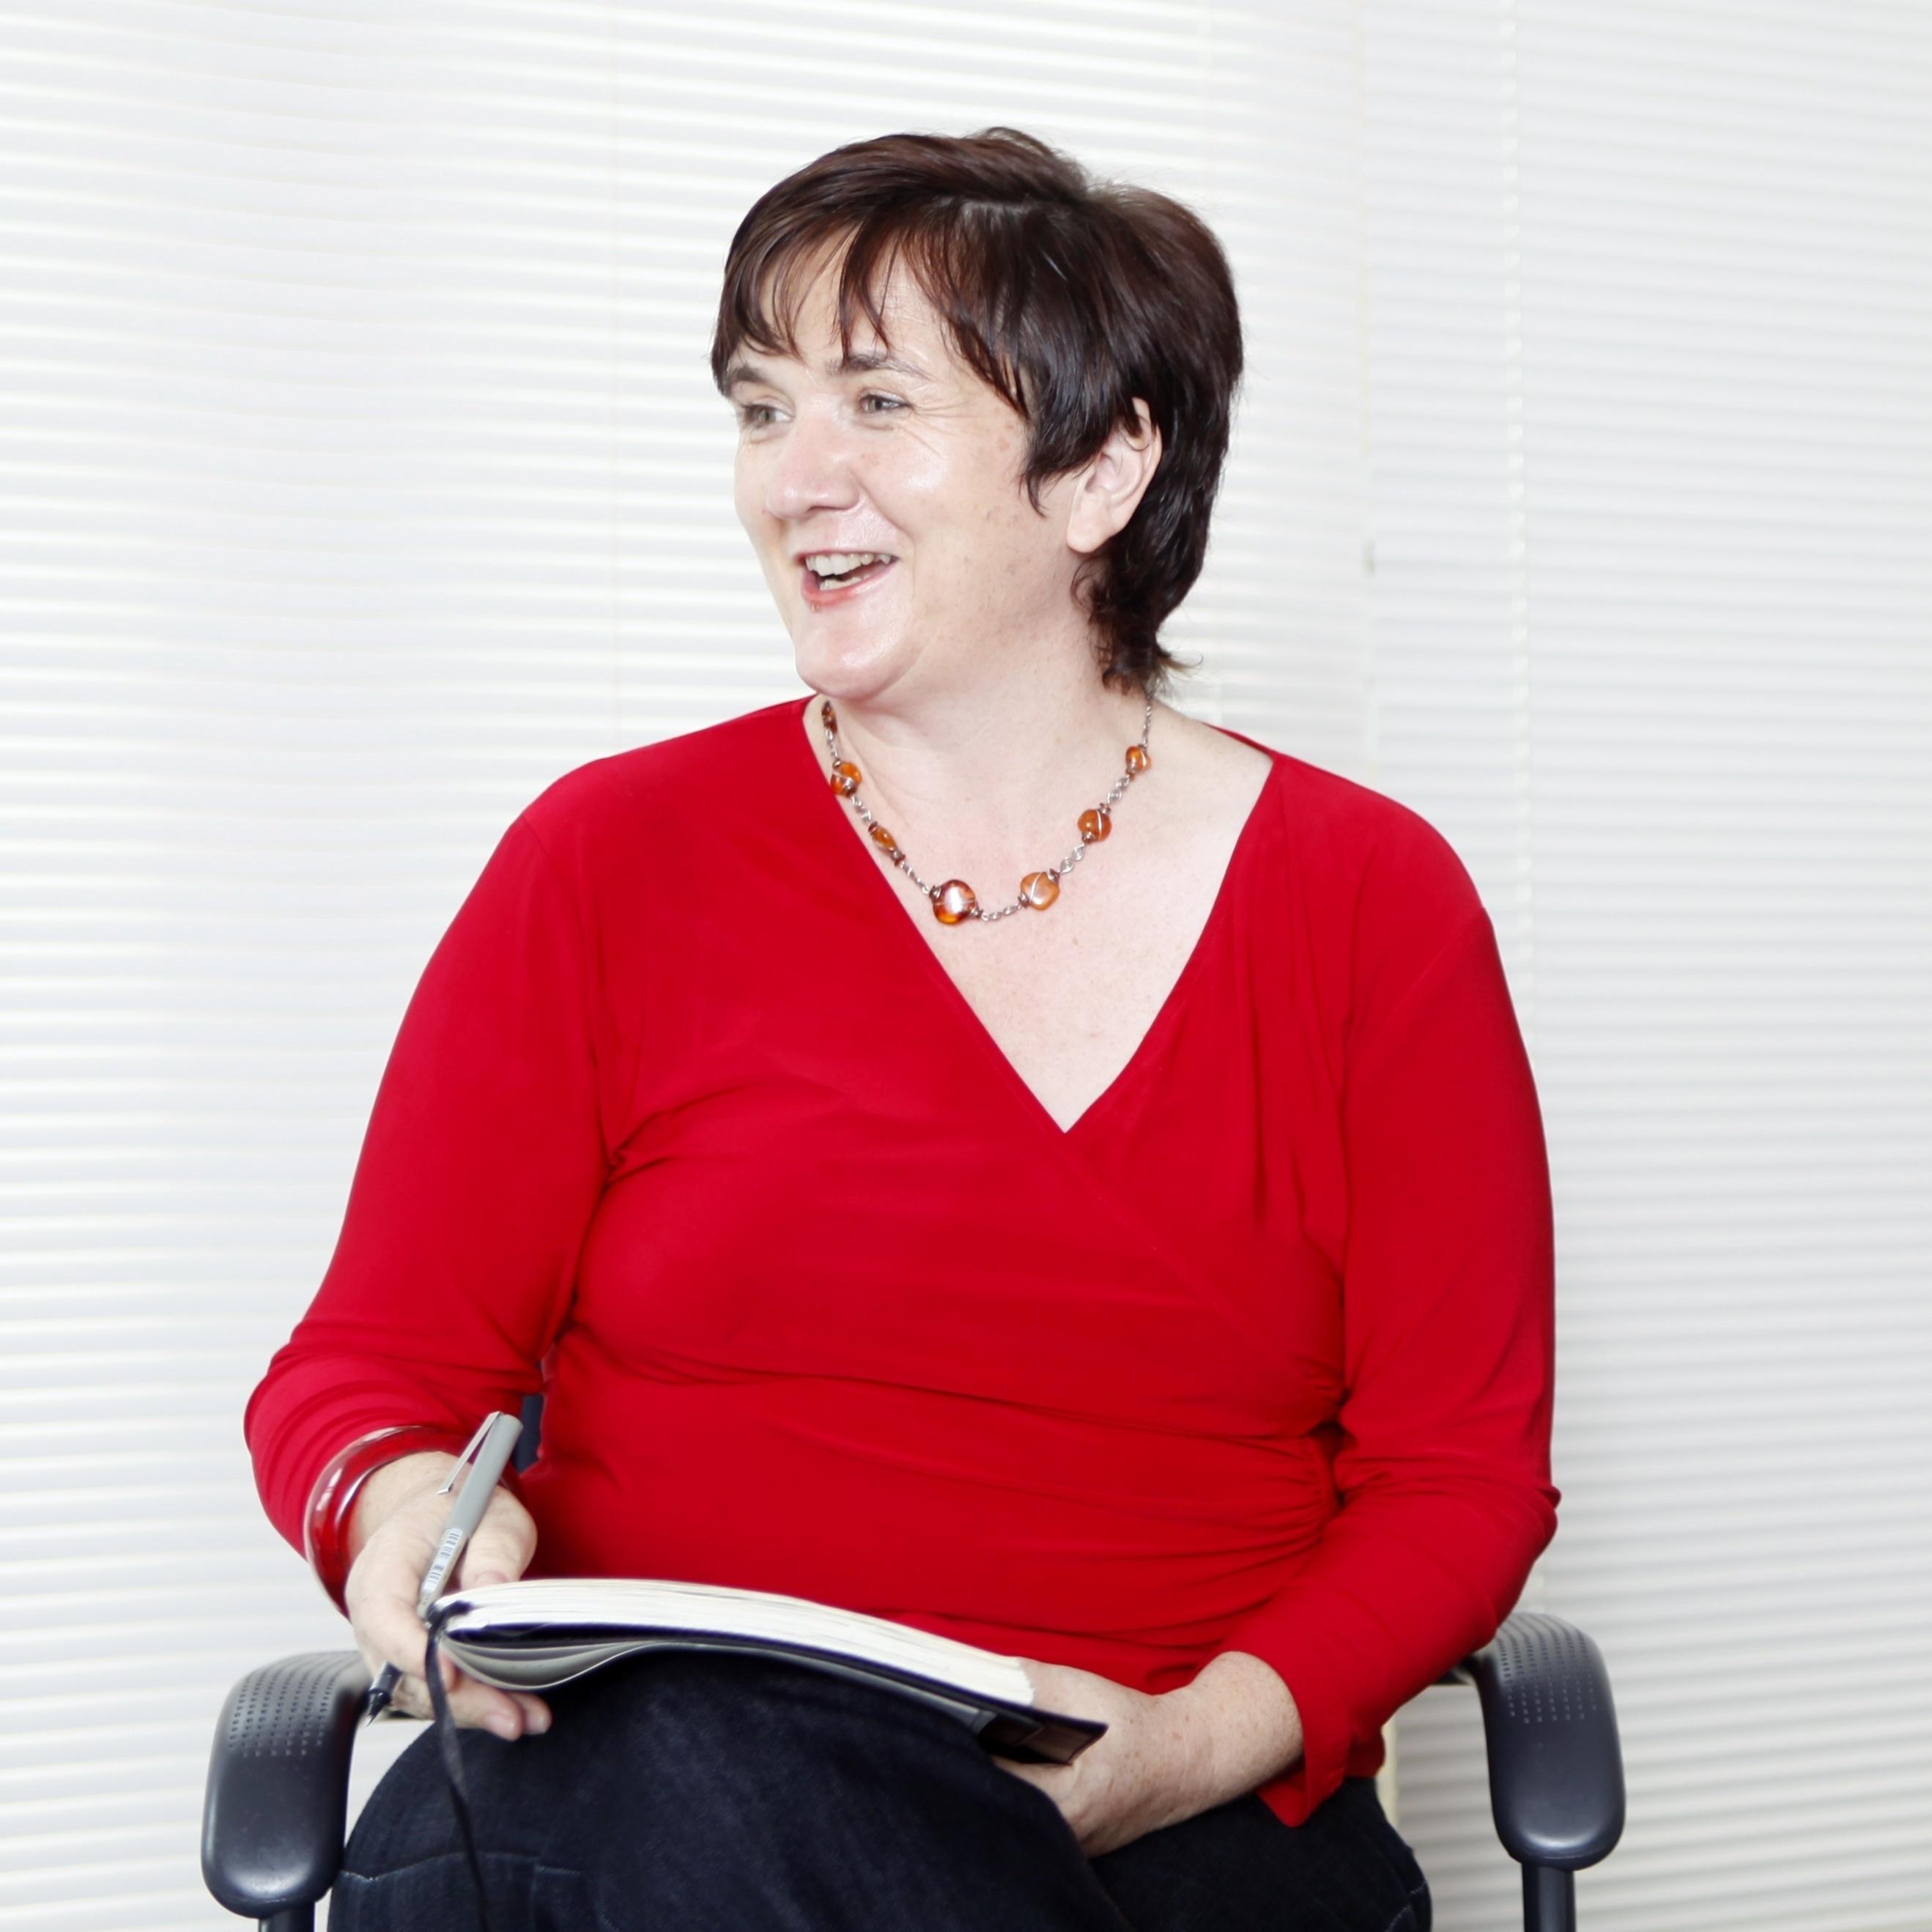 Liz Skelton